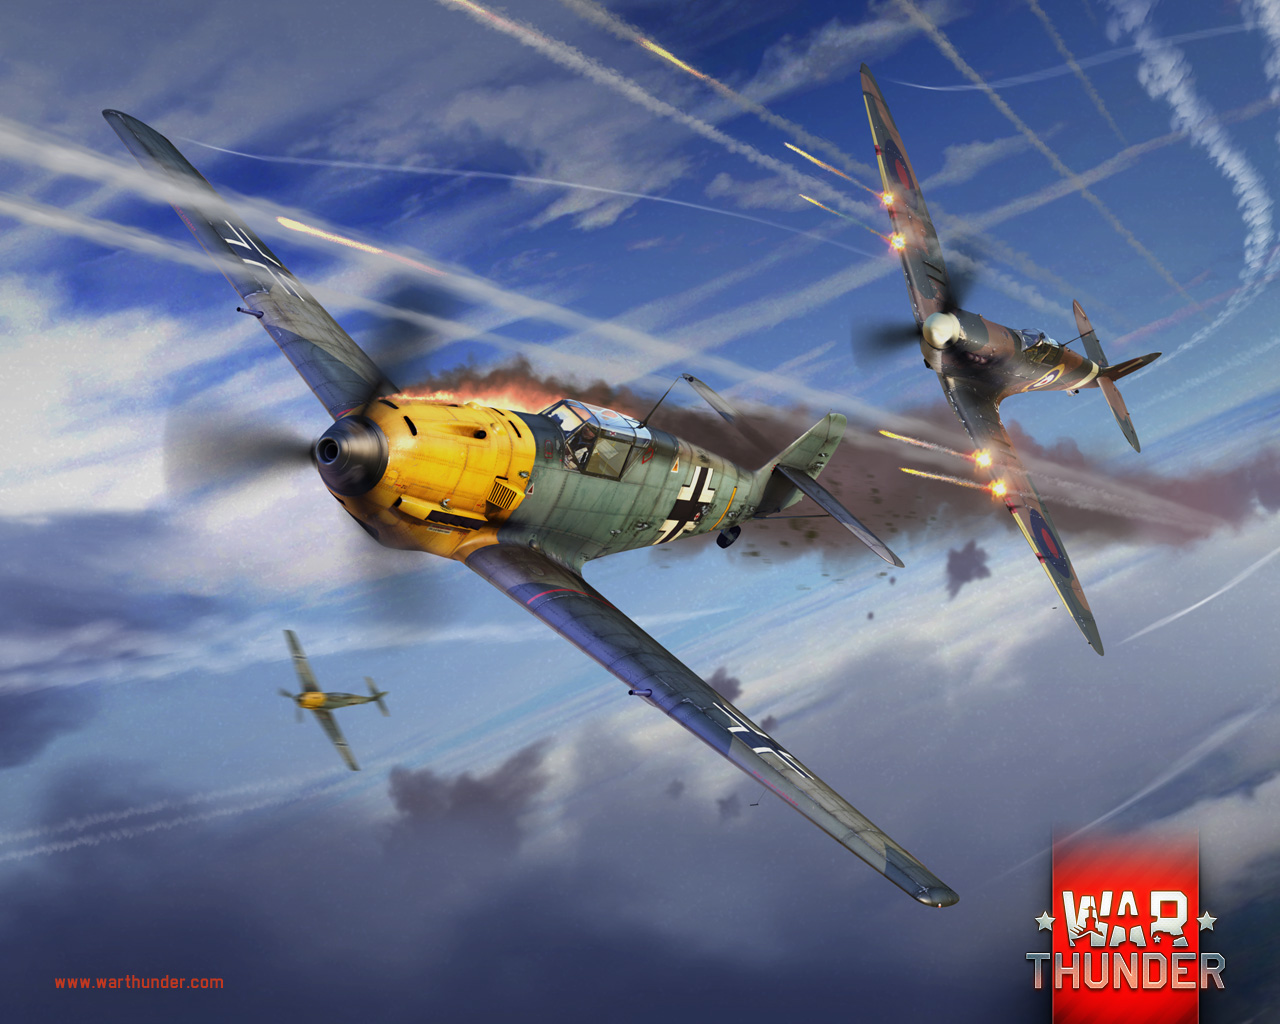 Wallpapers (6 - Page) Media - War Thunder